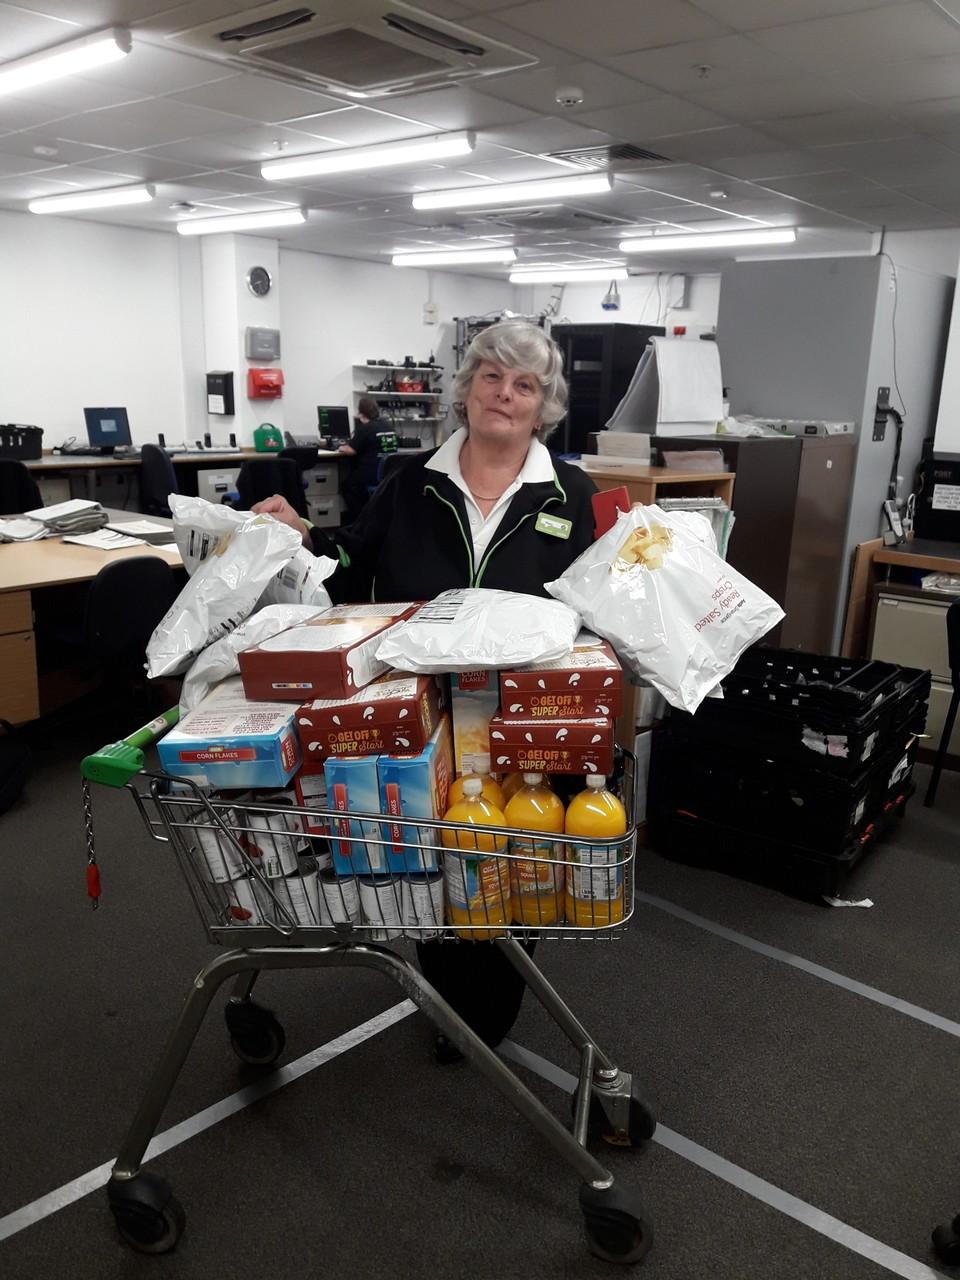 Donation to the food bank | Asda Taunton